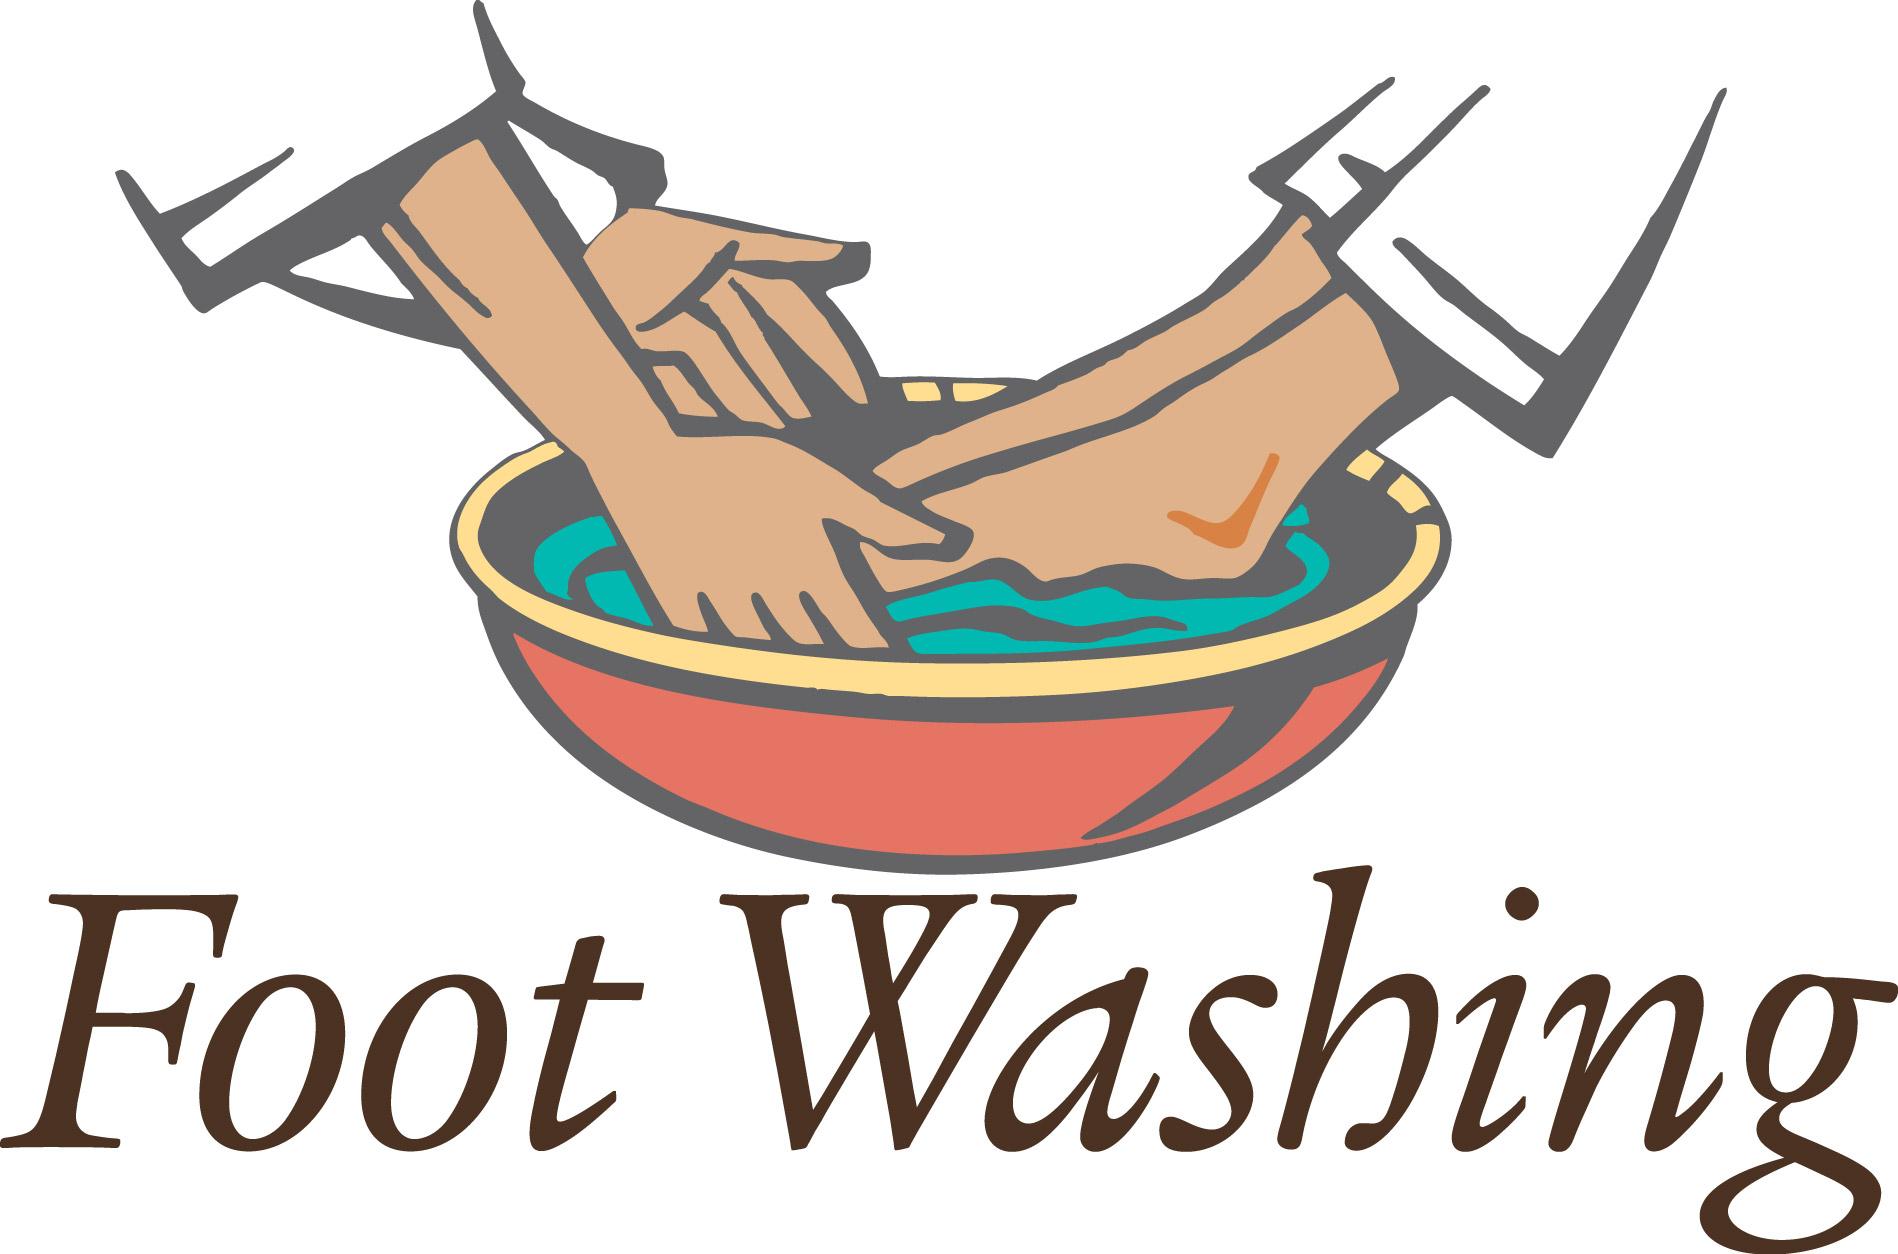 Washing Feet Clip Art.